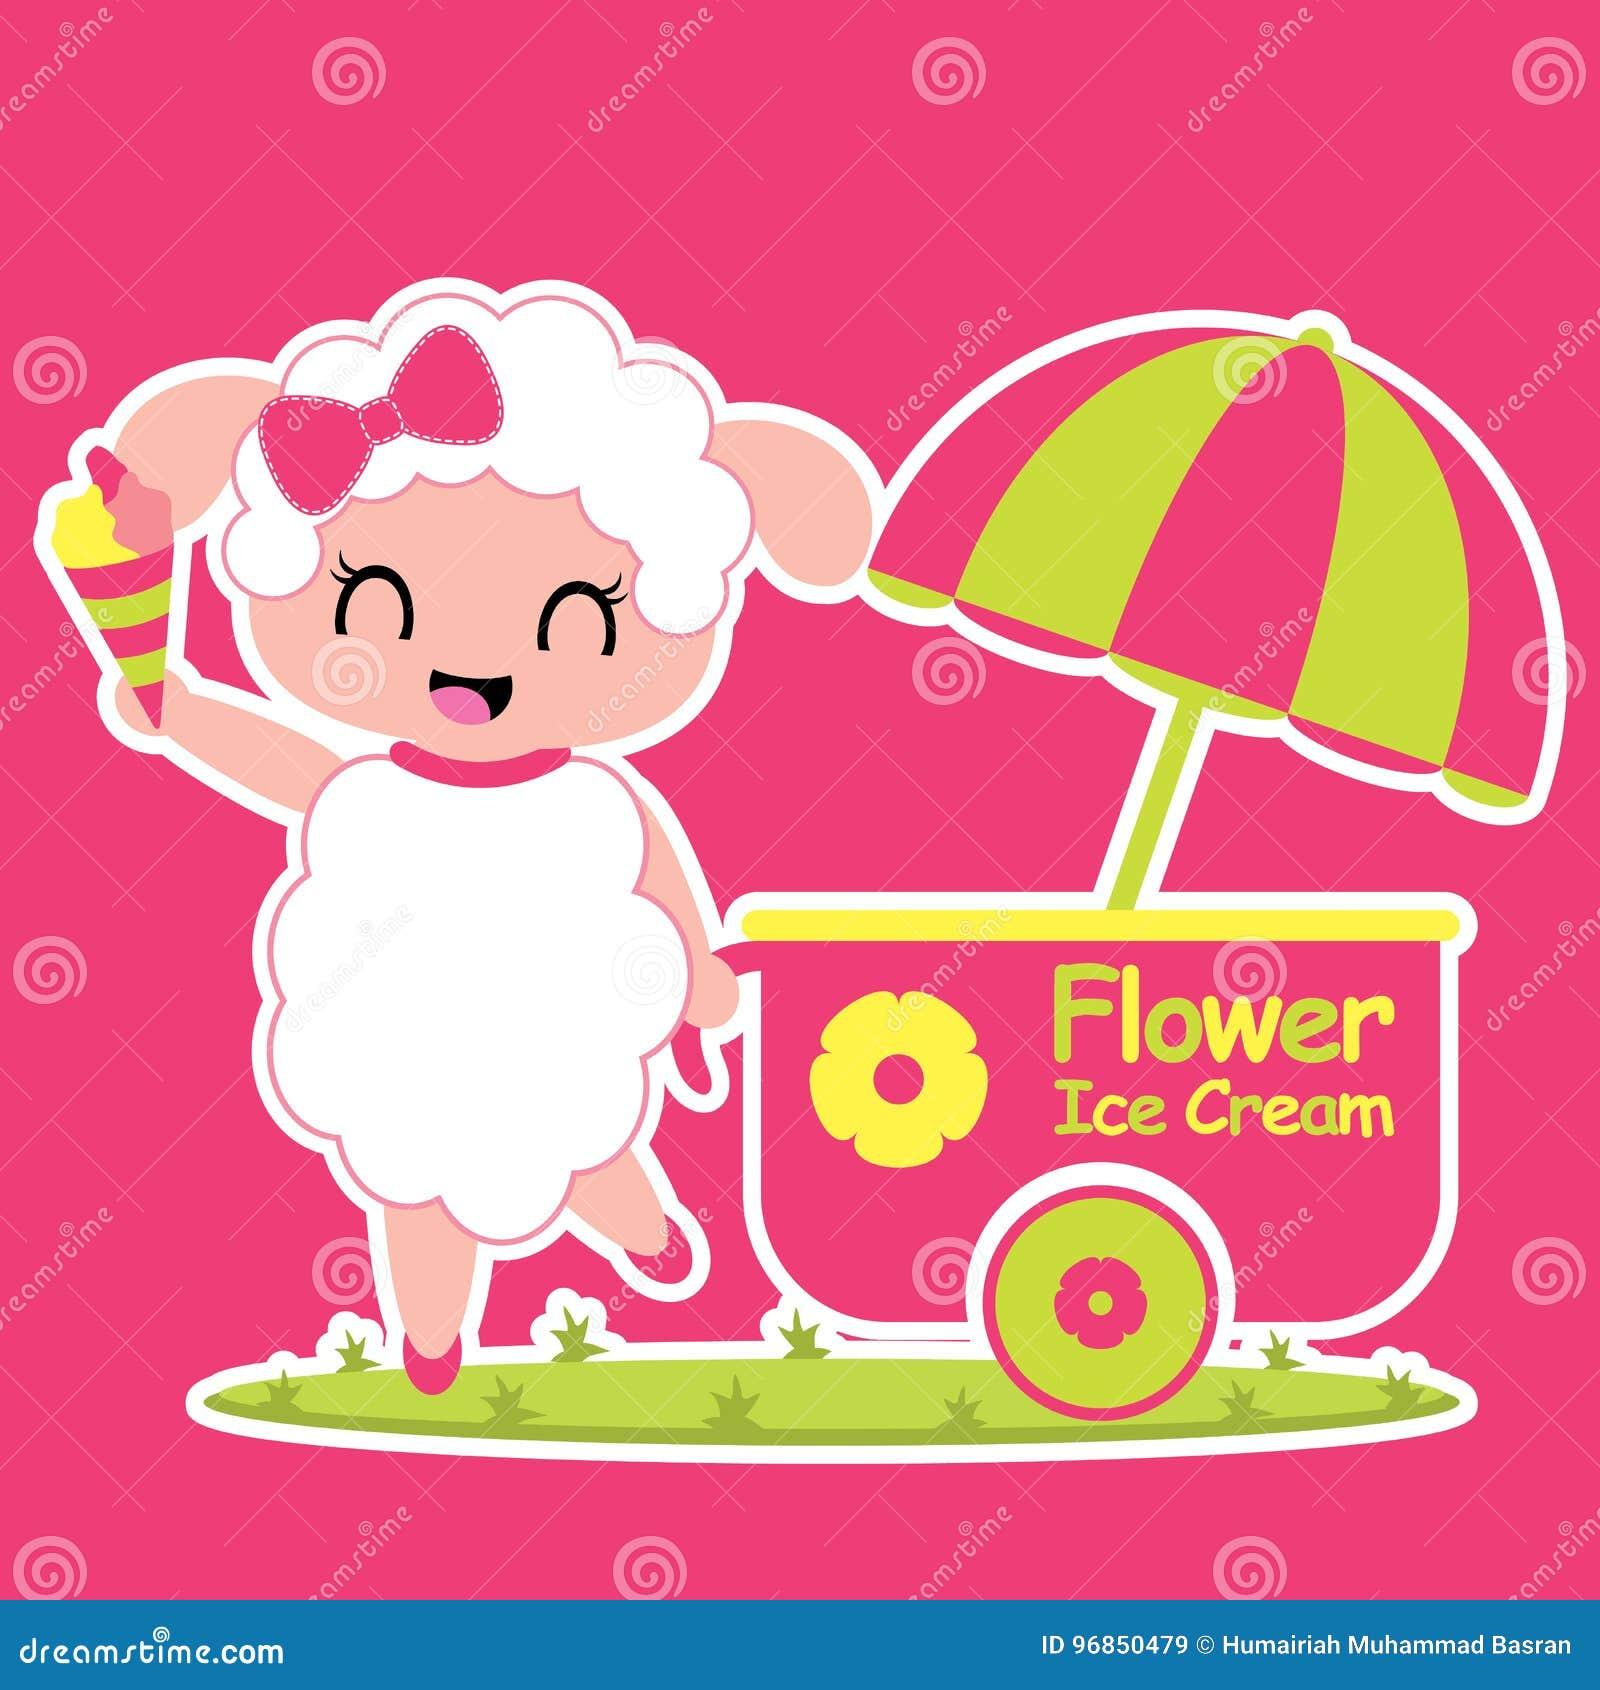 Cute sheep sells ice cream cartoon illustration for kid t shirt design, nursery wall, and wallpaper